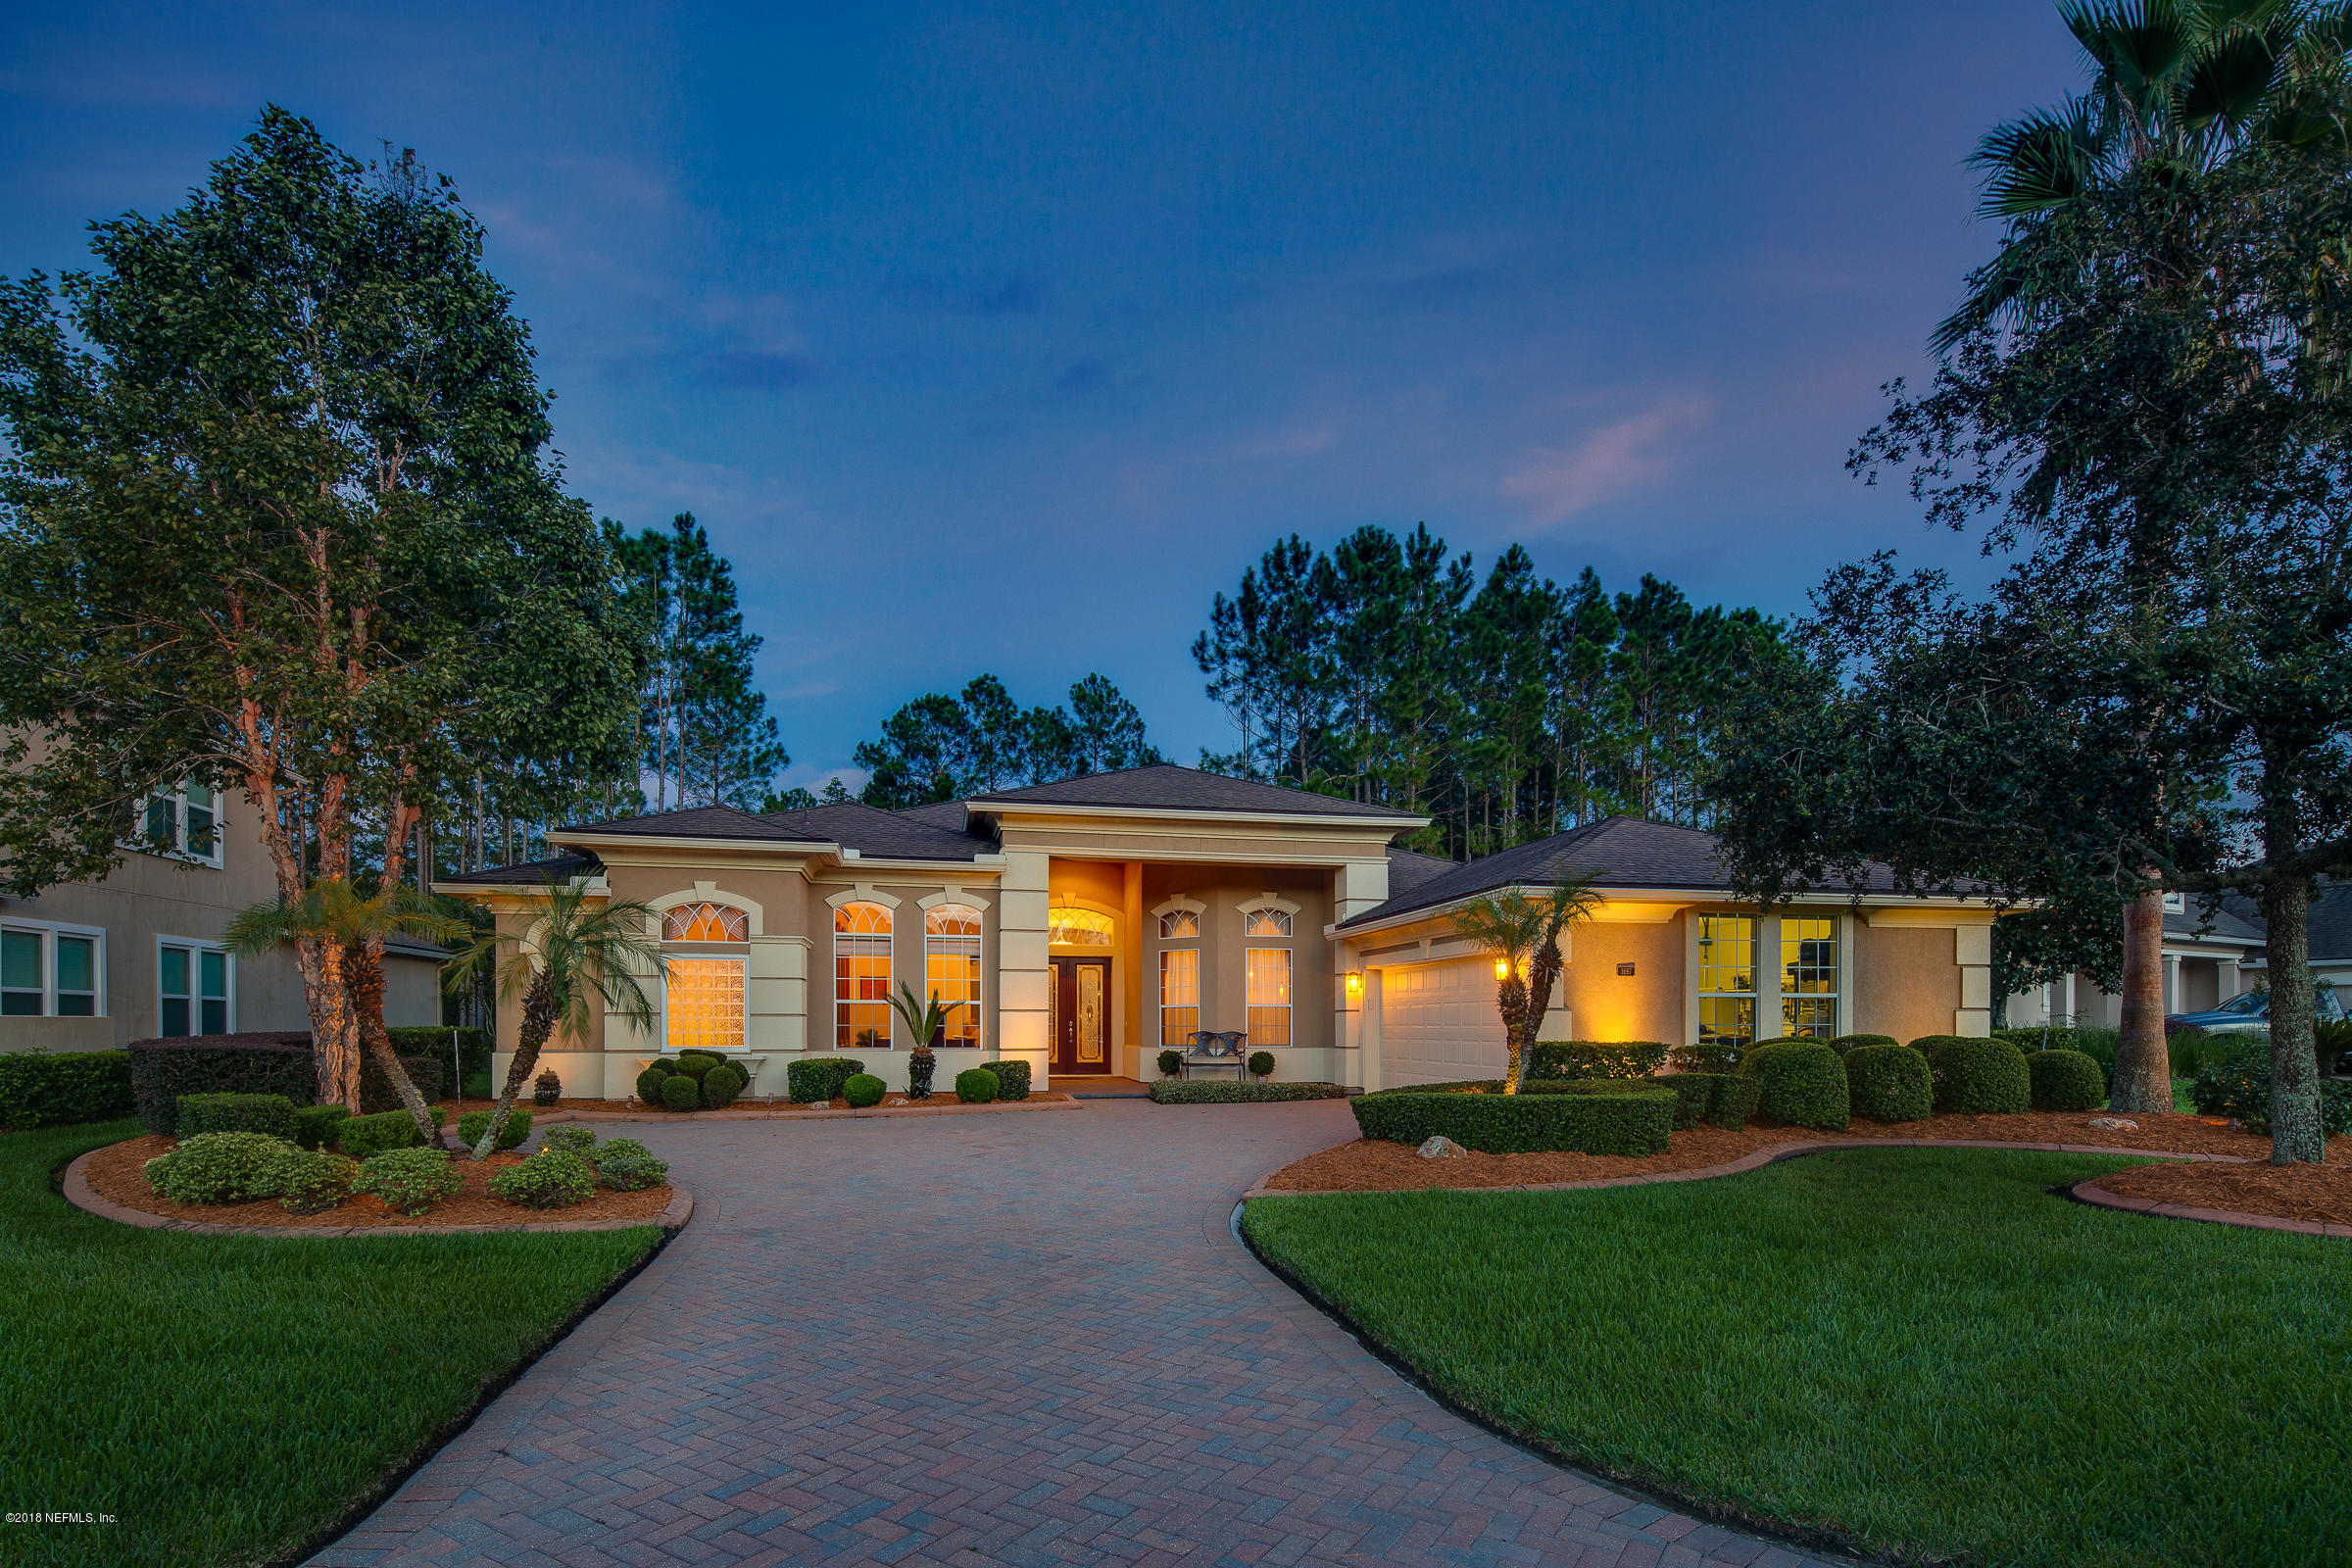 1697 WILD DUNES, ORANGE PARK, FLORIDA 32065, 4 Bedrooms Bedrooms, ,3 BathroomsBathrooms,Residential - single family,For sale,WILD DUNES,957429